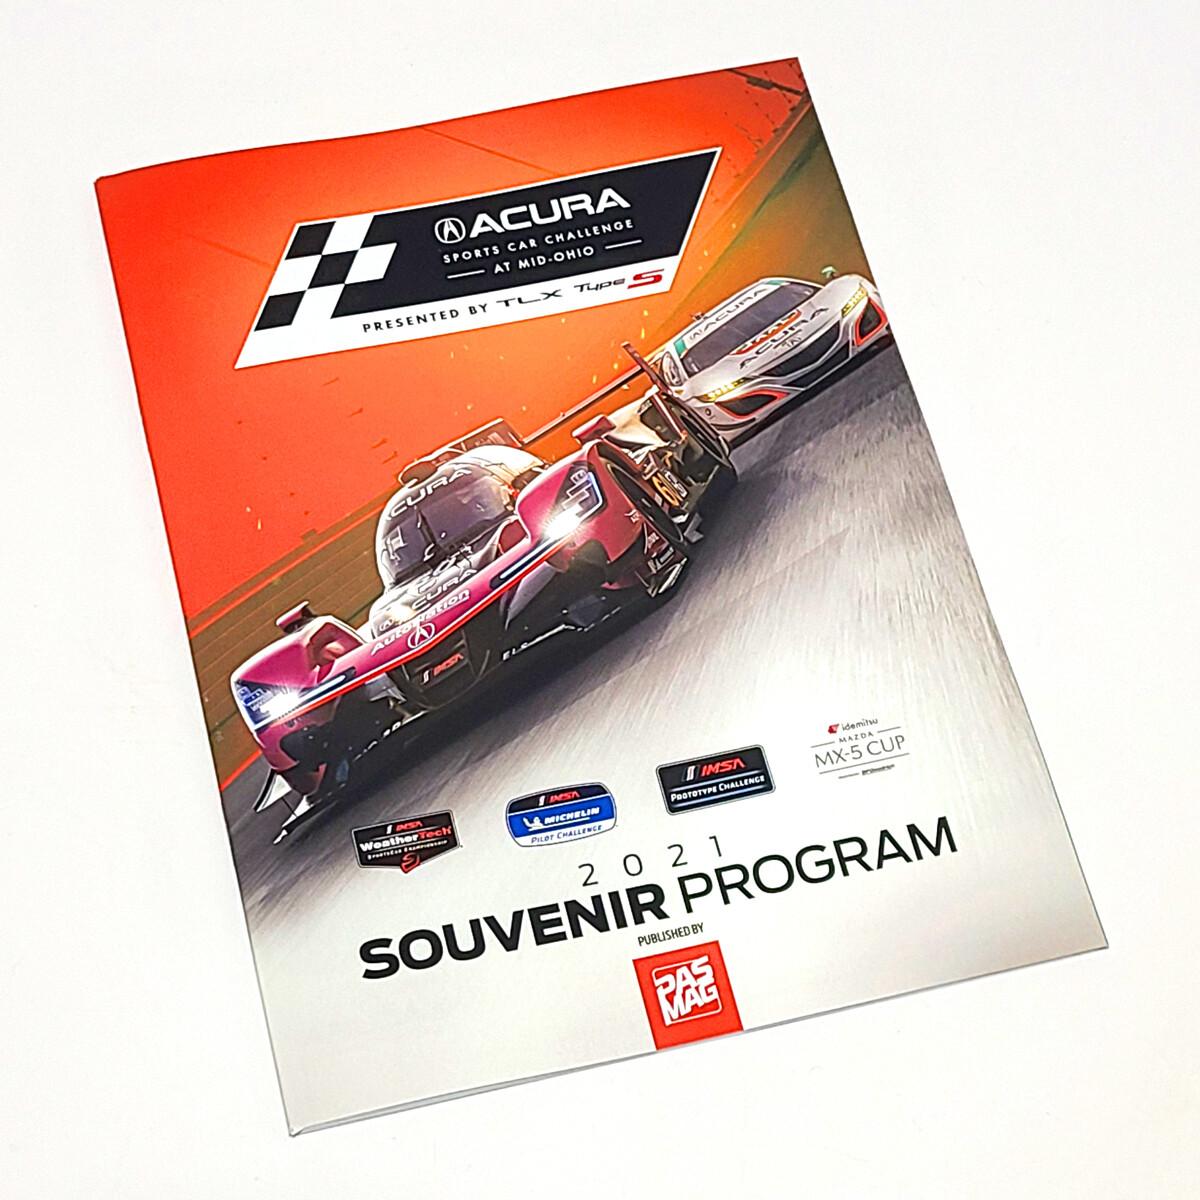 2021 Program - Acura Sports Car Challenge